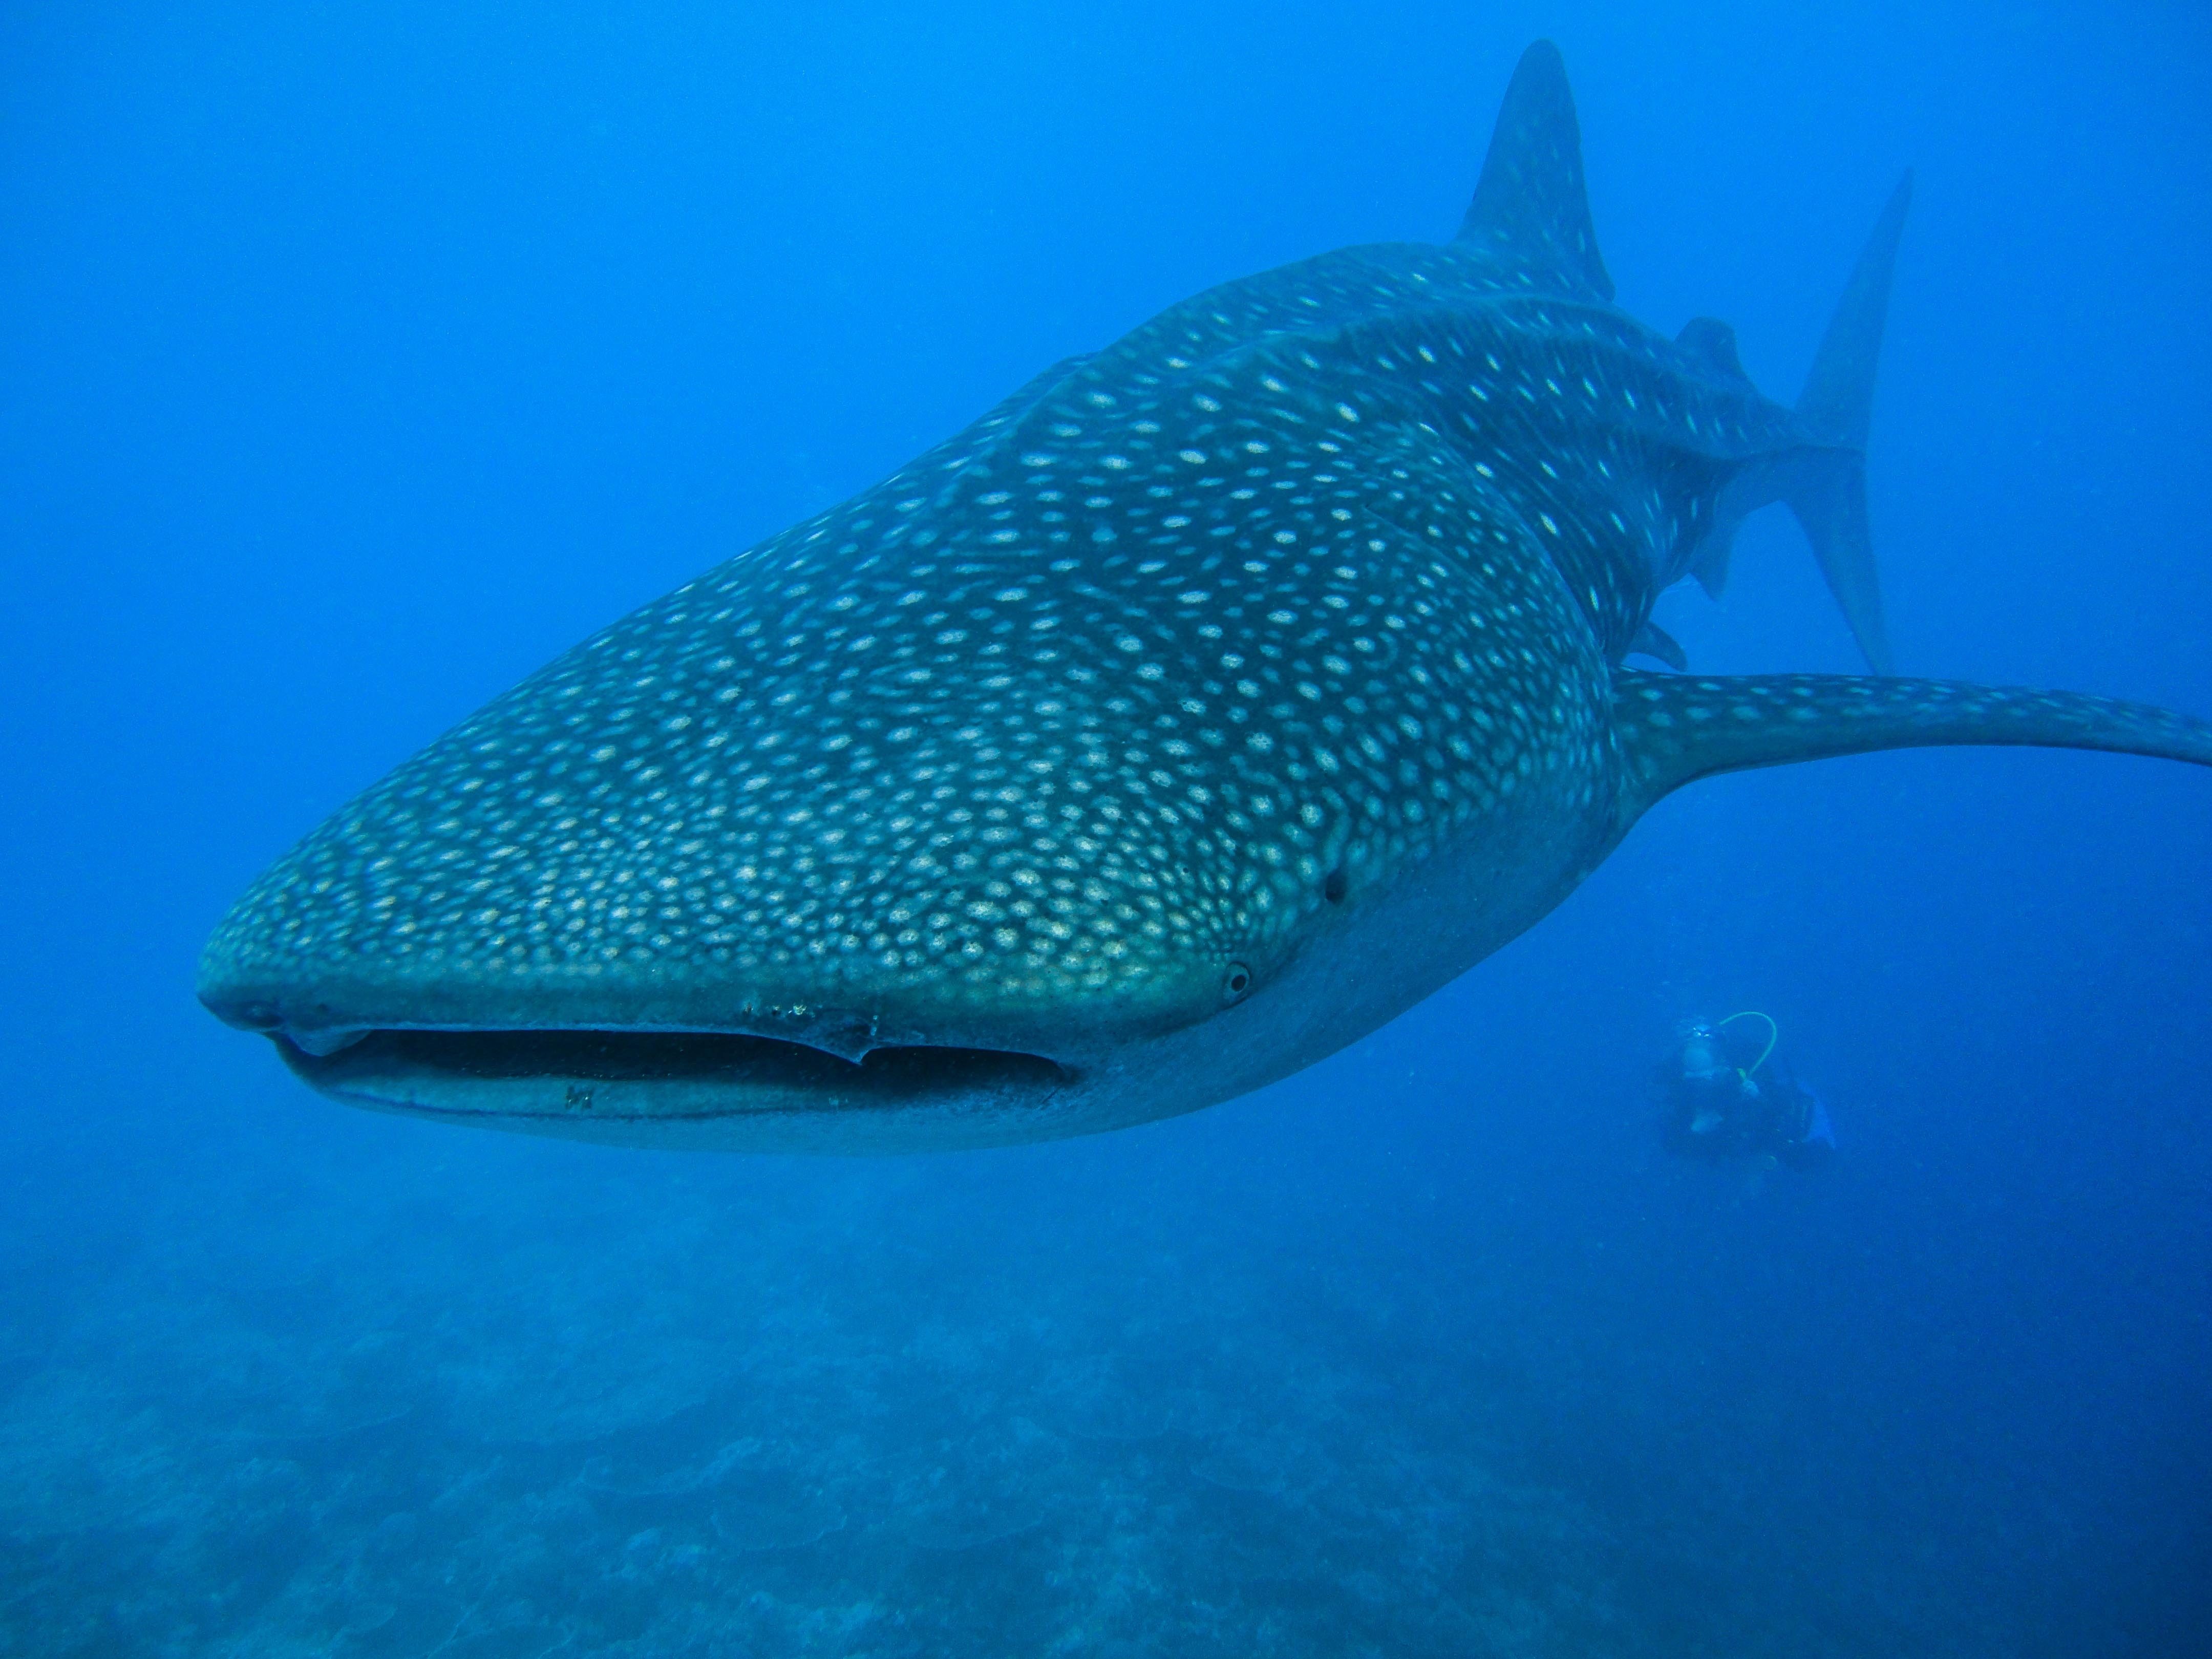 Lacabana Maldives  A DhMaamigili Island Whale Shark (3)